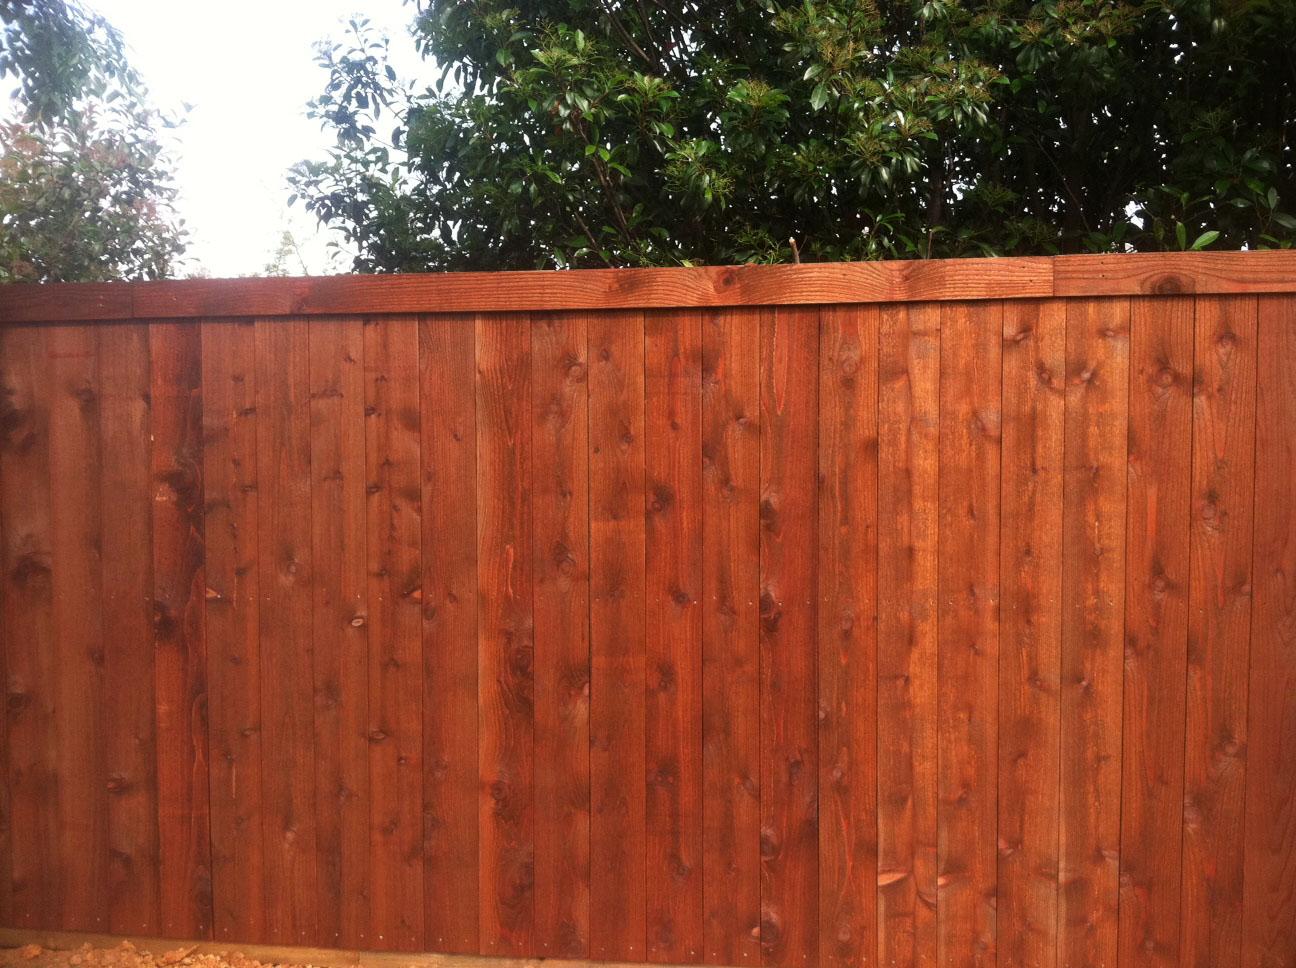 Superbe Budget Cedar Fences | Low Cost Cedar Fencing | Discount Cedar Fences